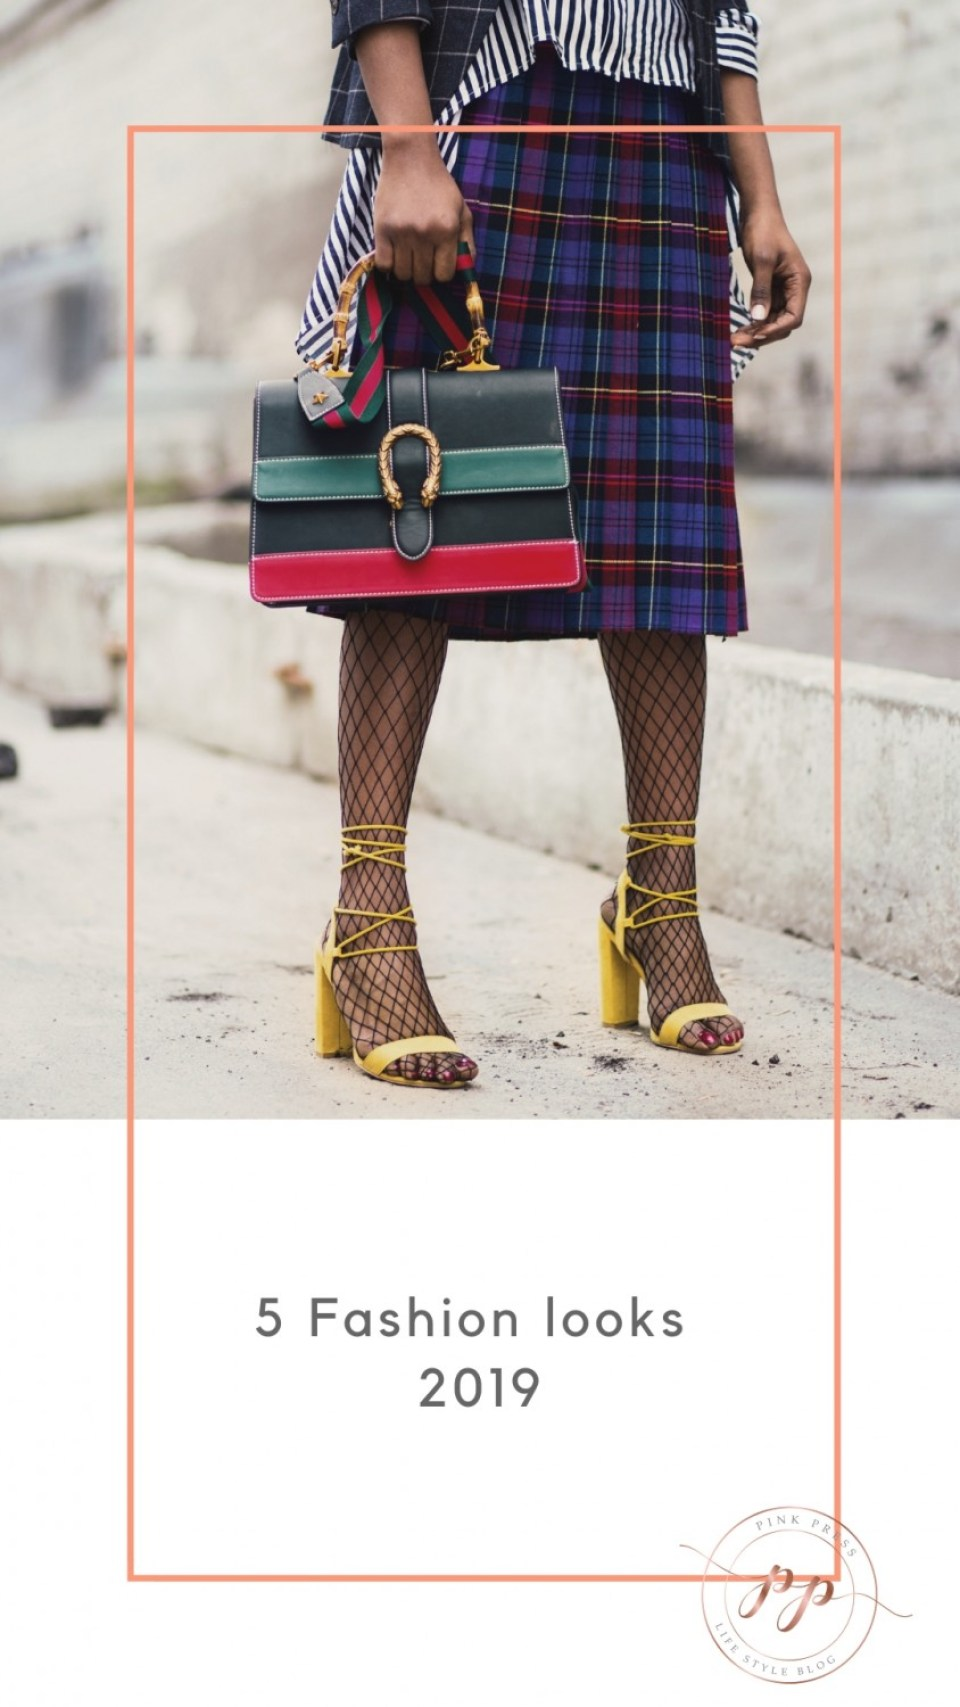 5 fashion looks 2019 - 5 Fashion looks voor lente 2019